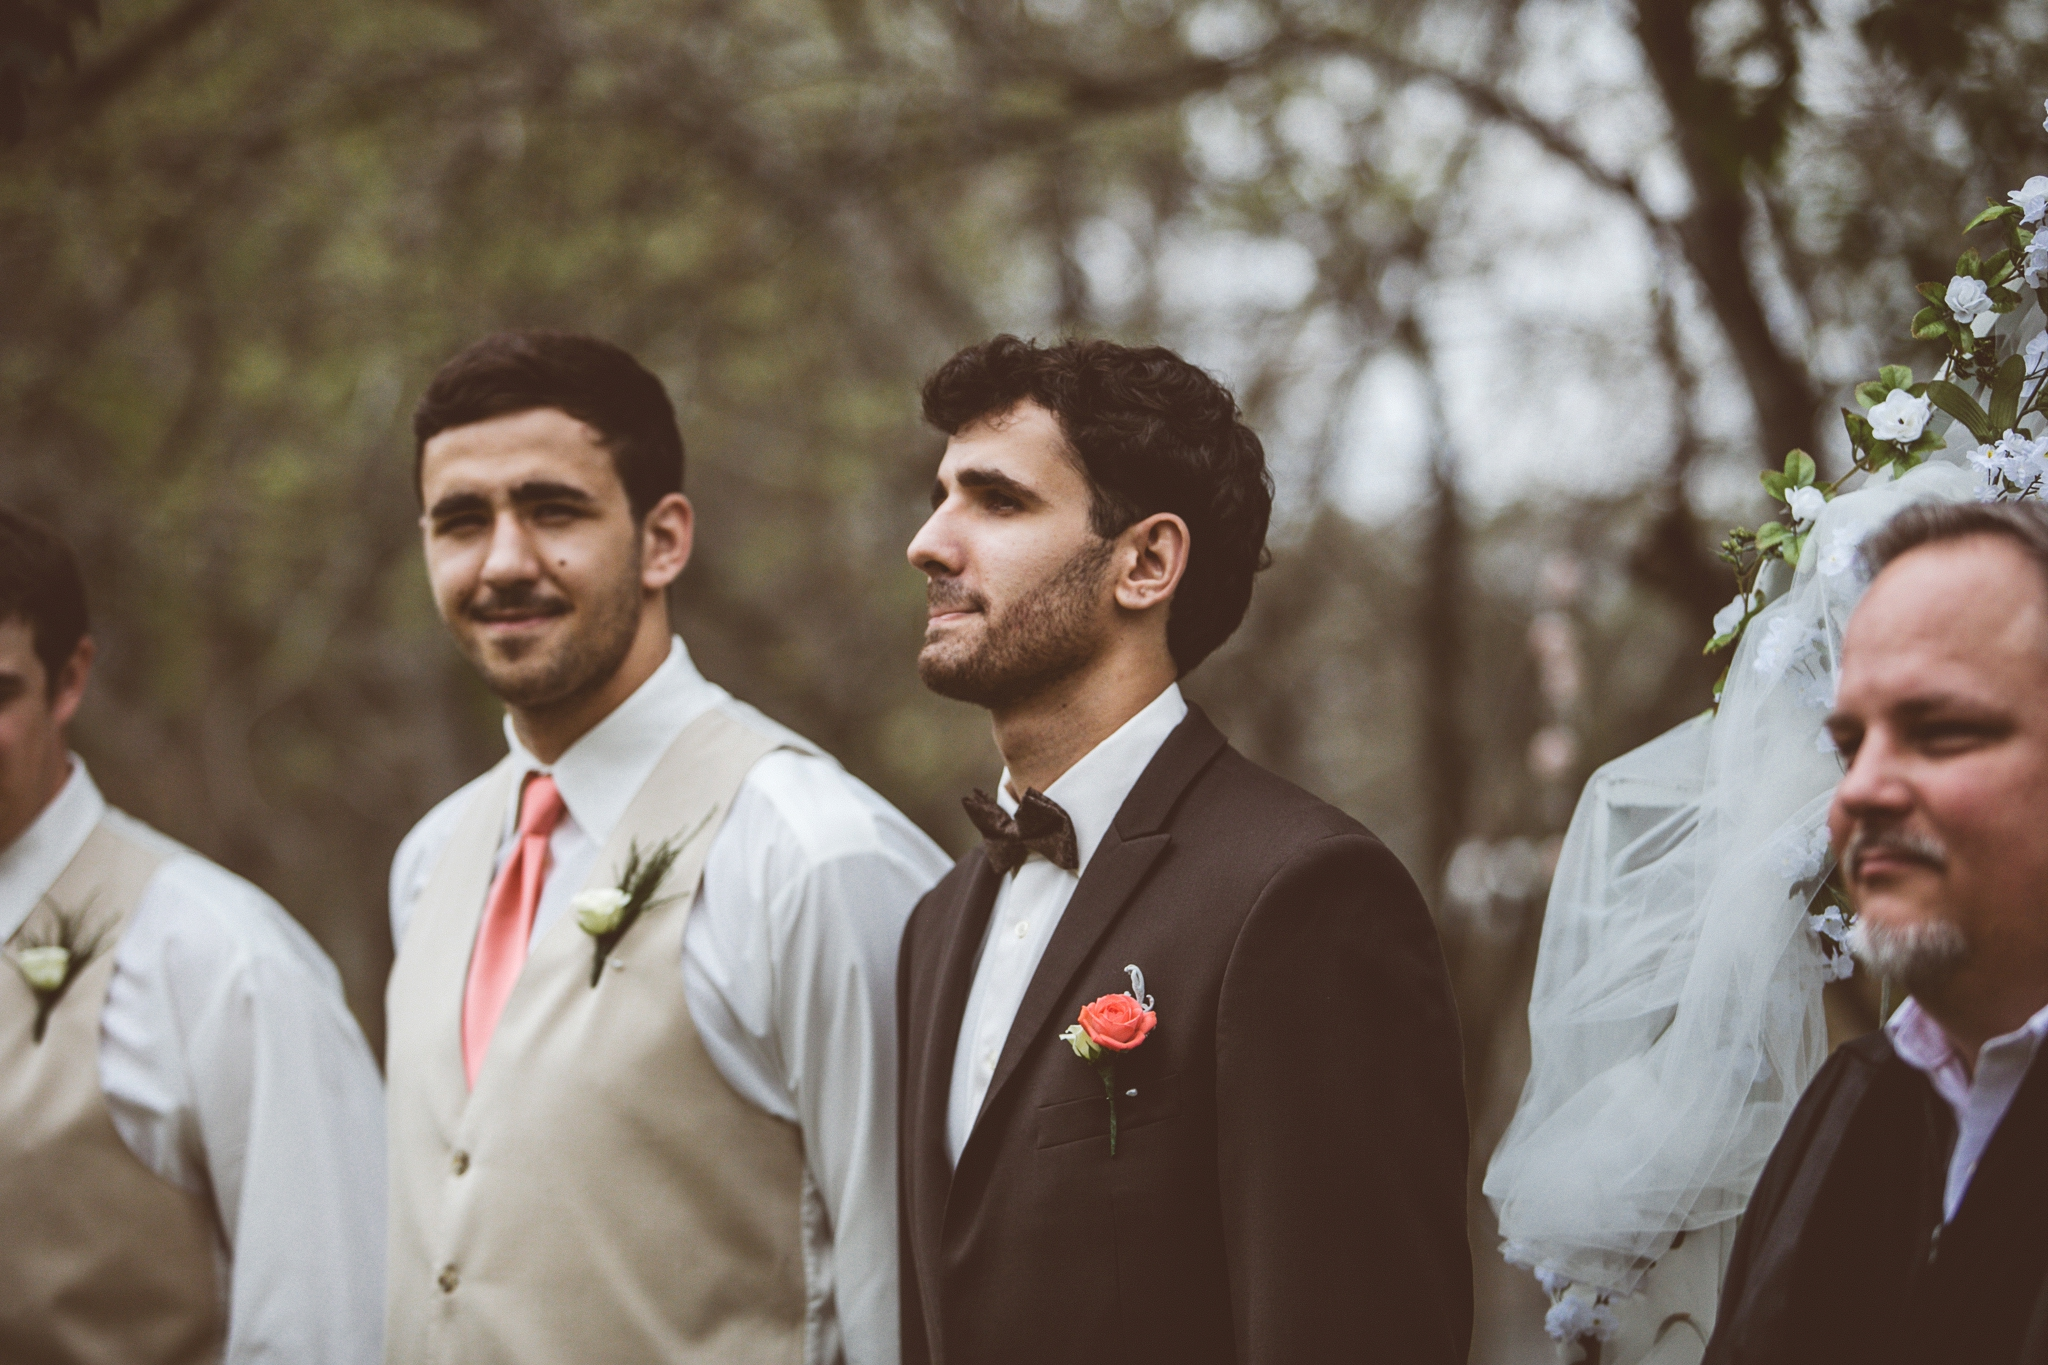 Milltown-Historic-Distric-Wedding-New-Braunfels-008.jpg